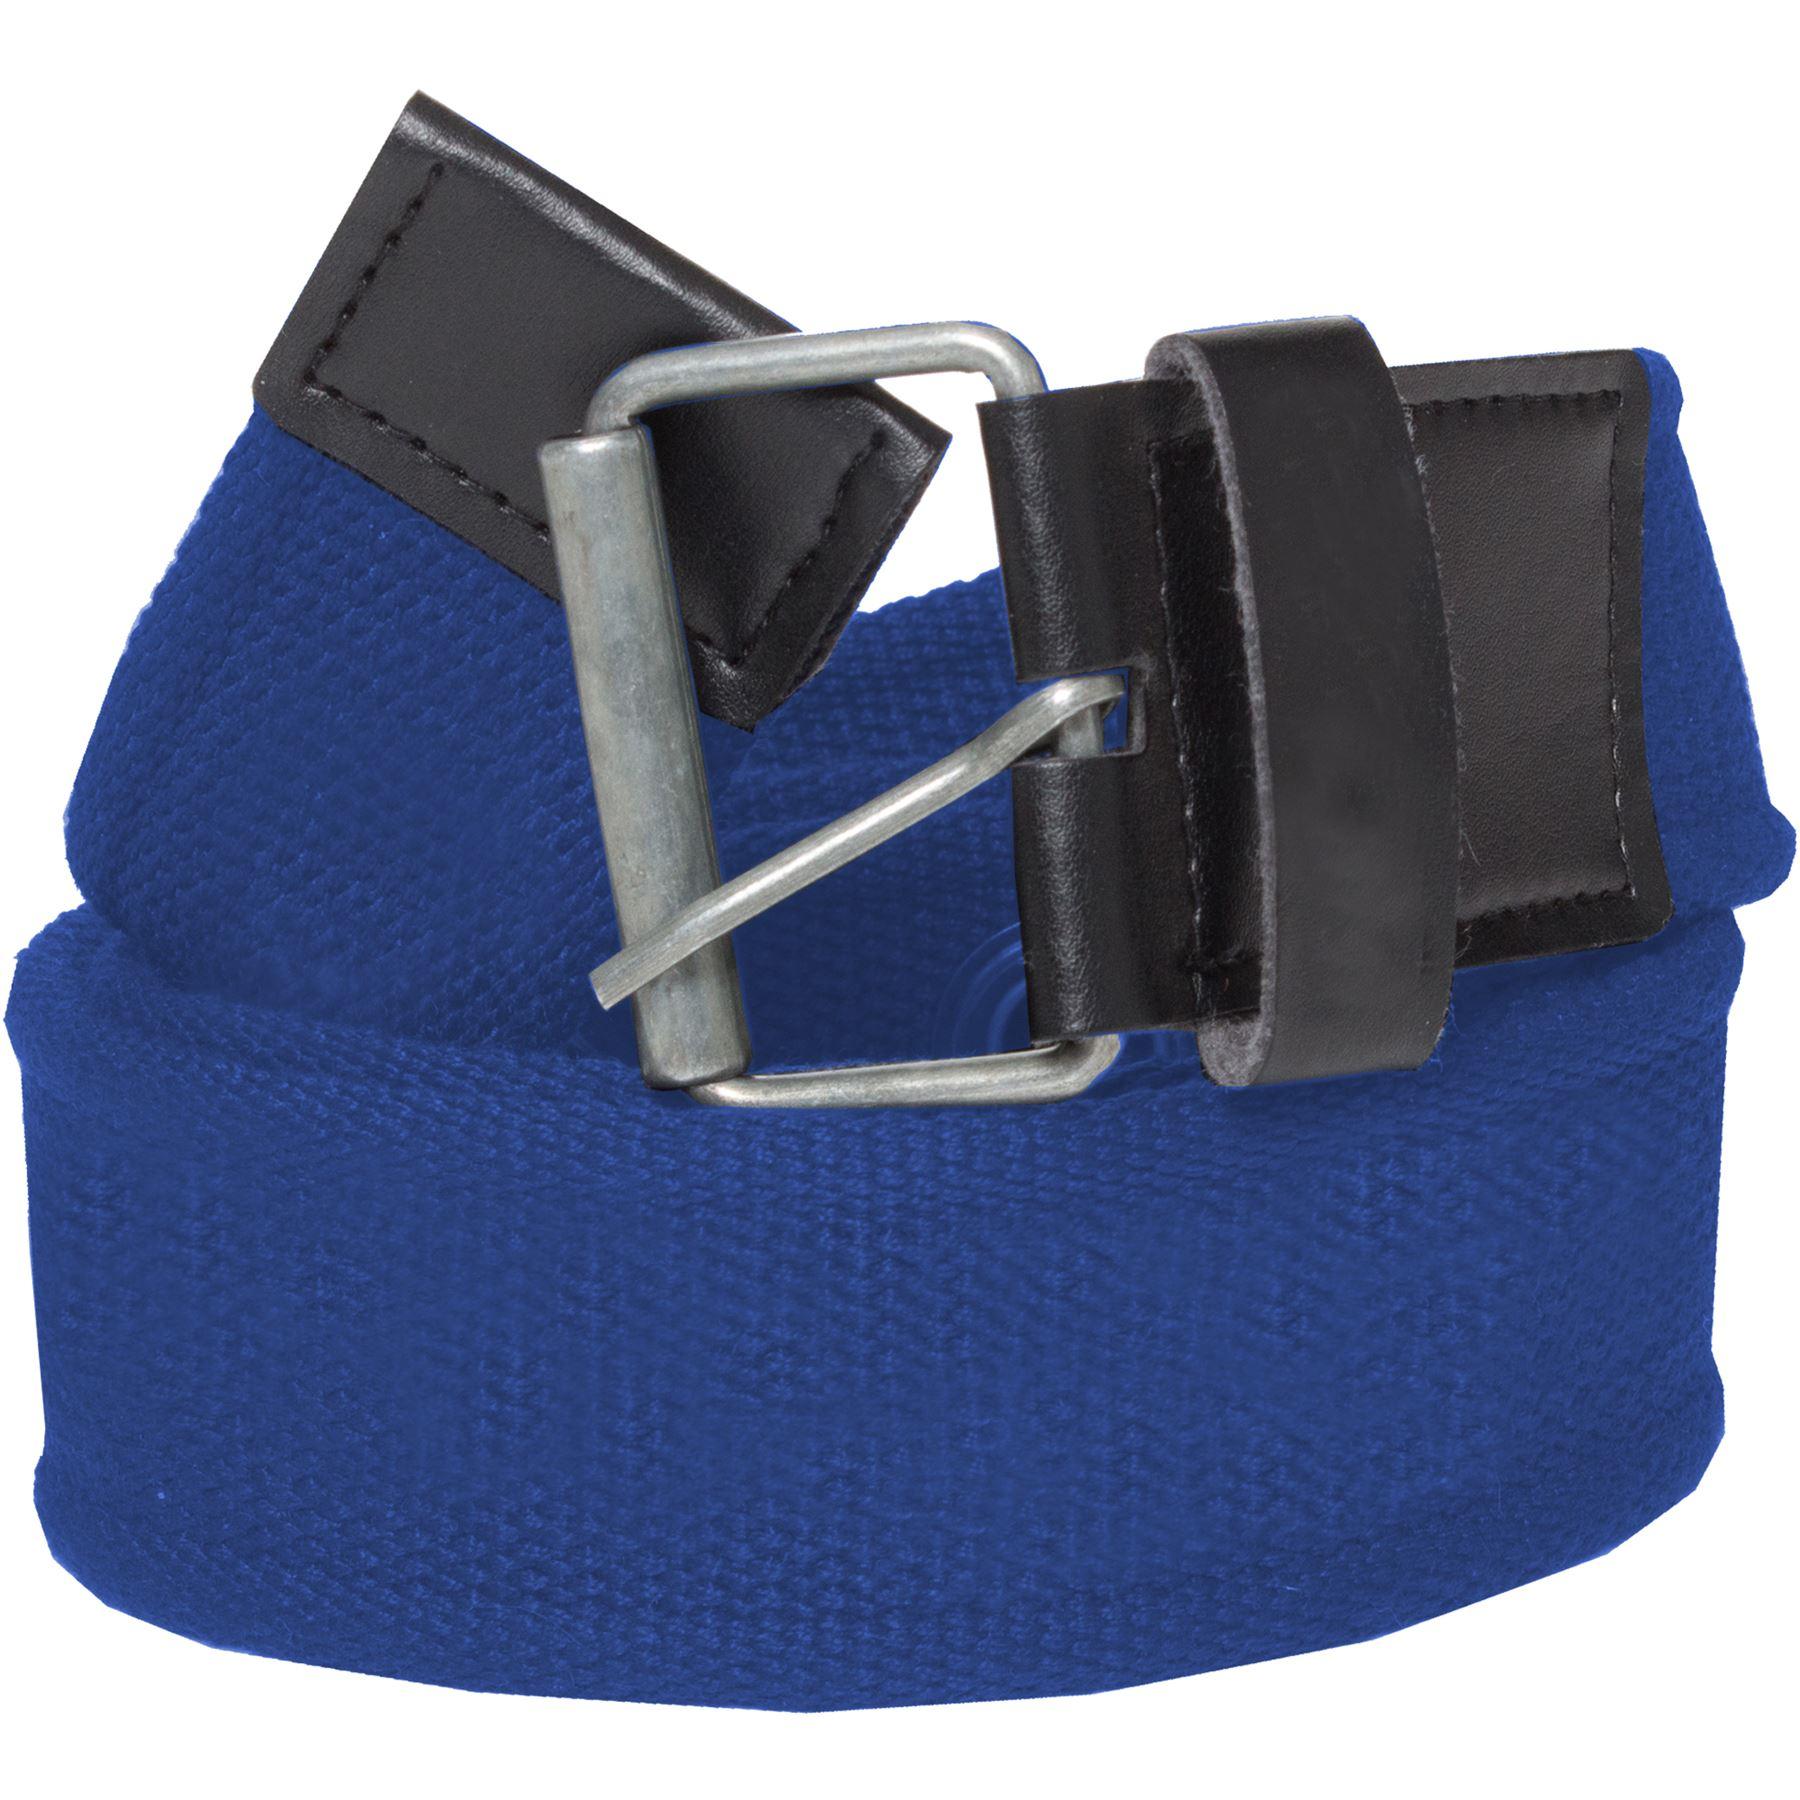 New-Kruze-Mens-Designer-Canvas-Buckle-Belt-For-Jeans-Big-Tall-King-Sizes